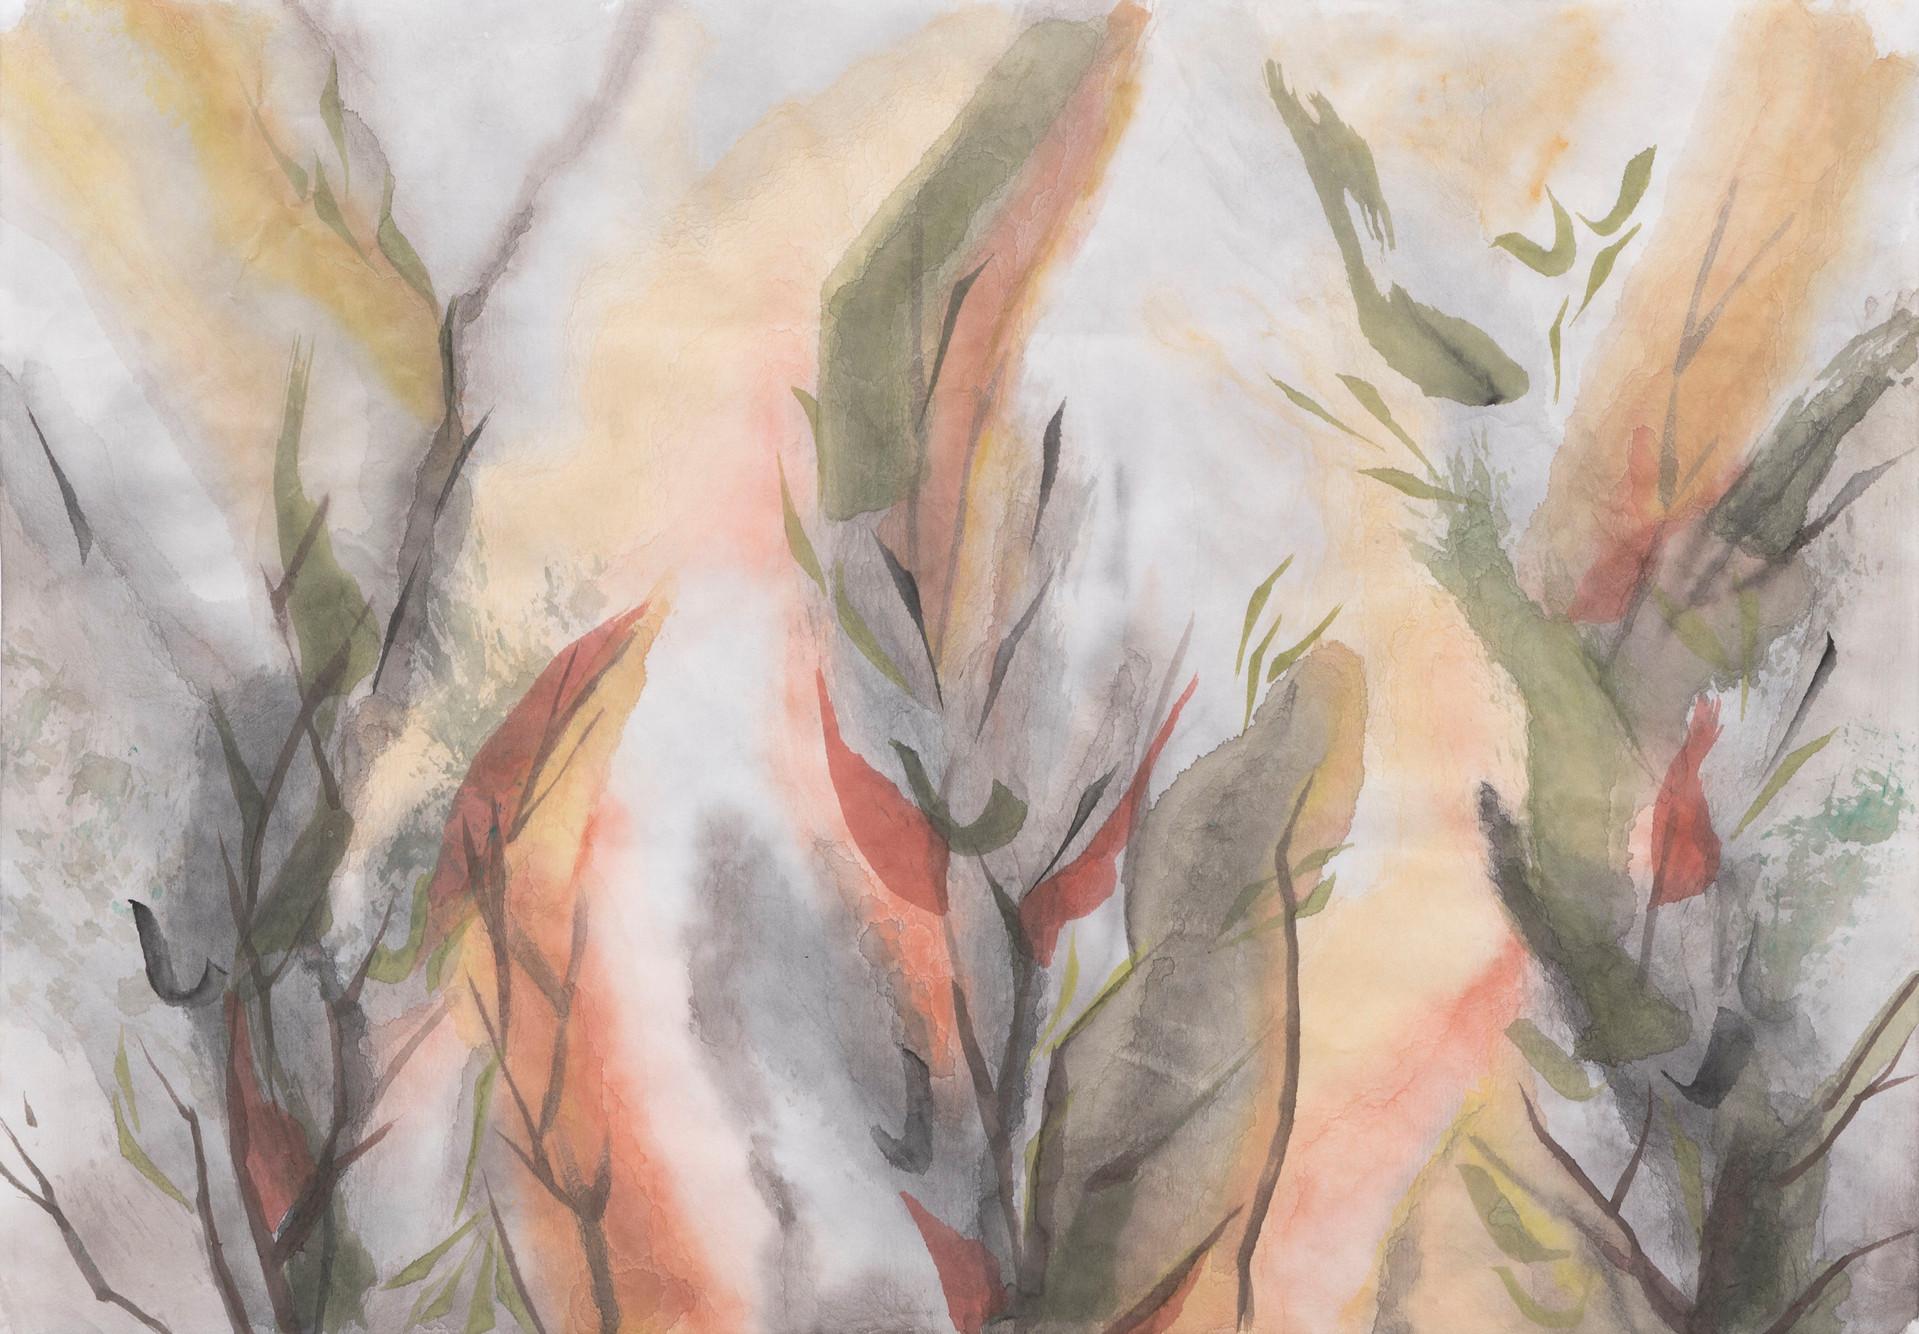 Untitled - three plants, autumn color